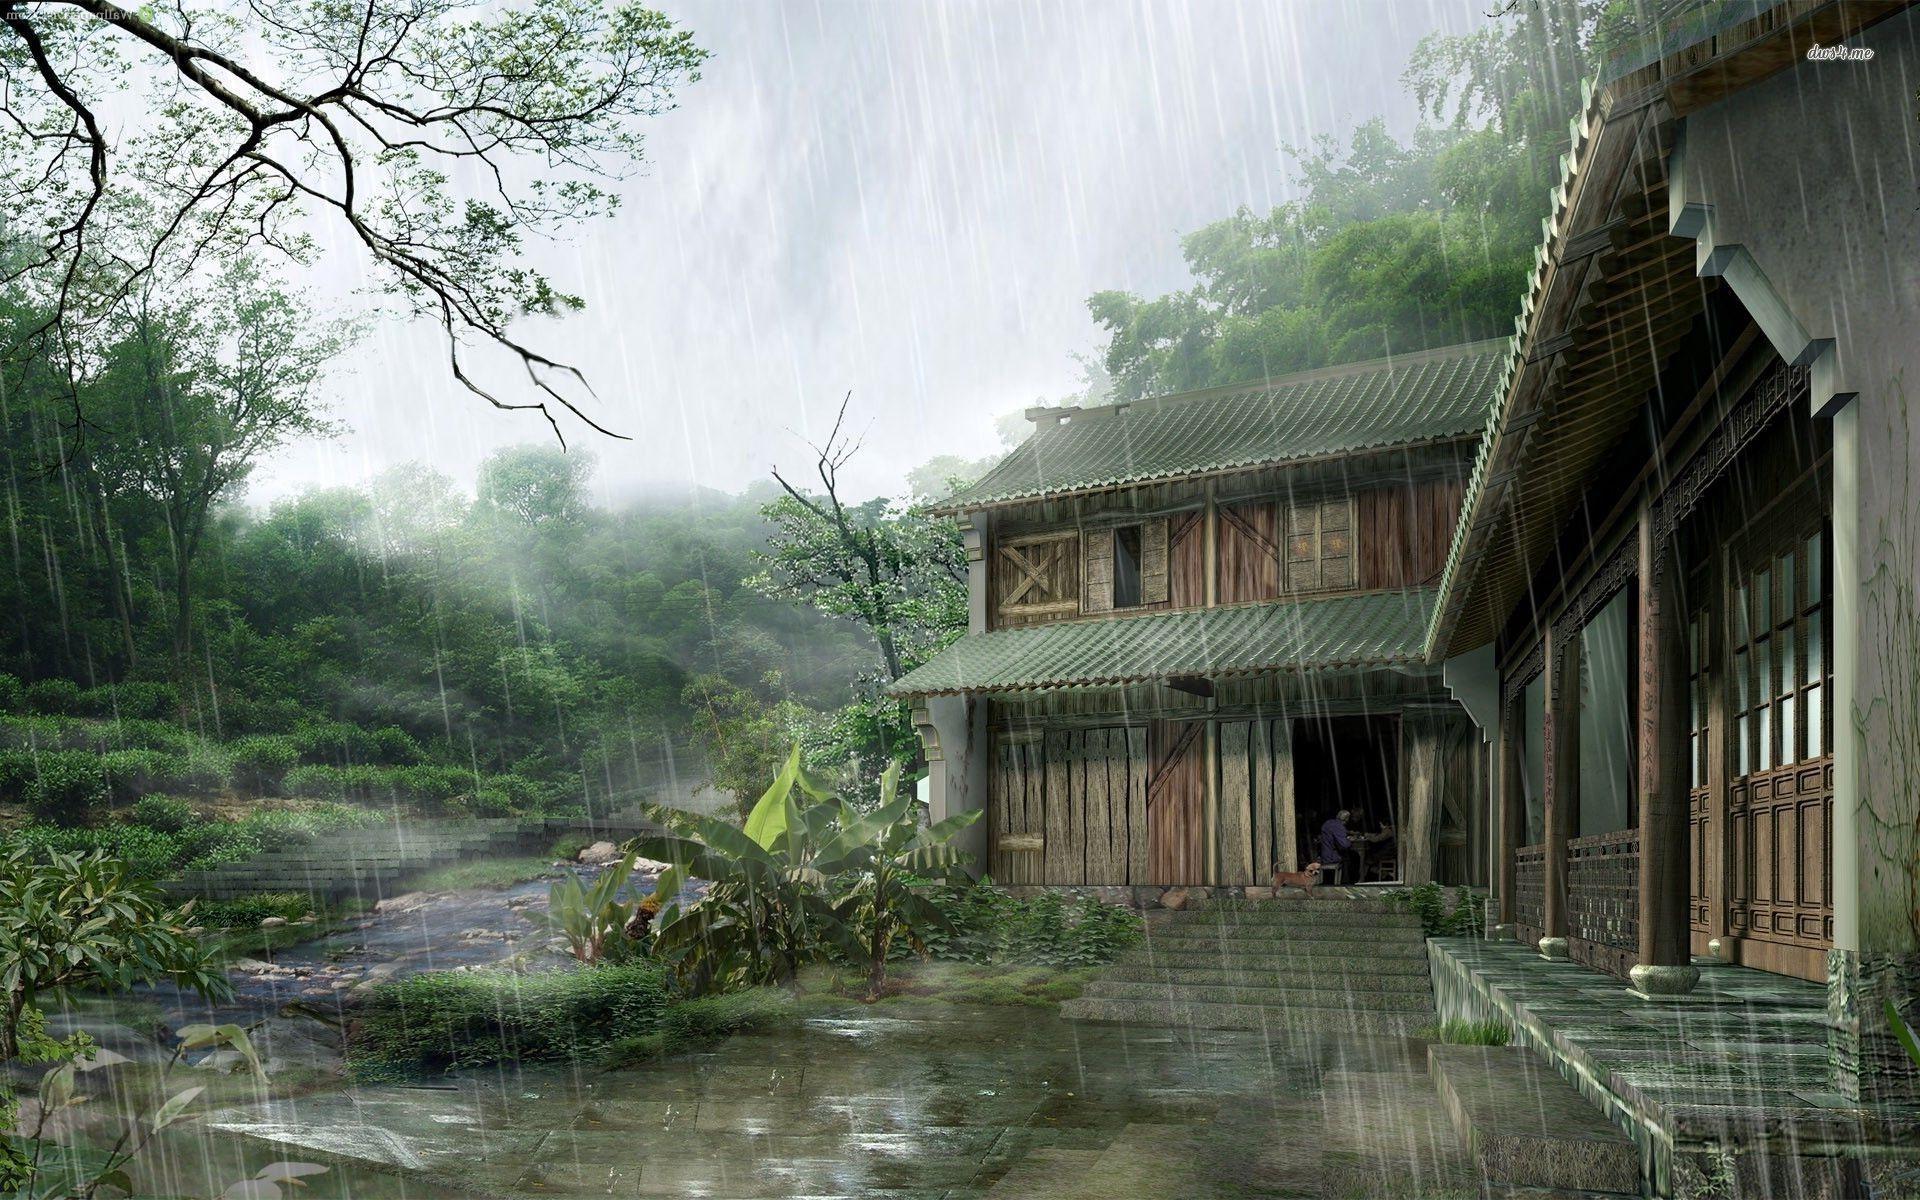 Rainy Window Hd Wallpaper Live Wallpapers Home Art Dojo